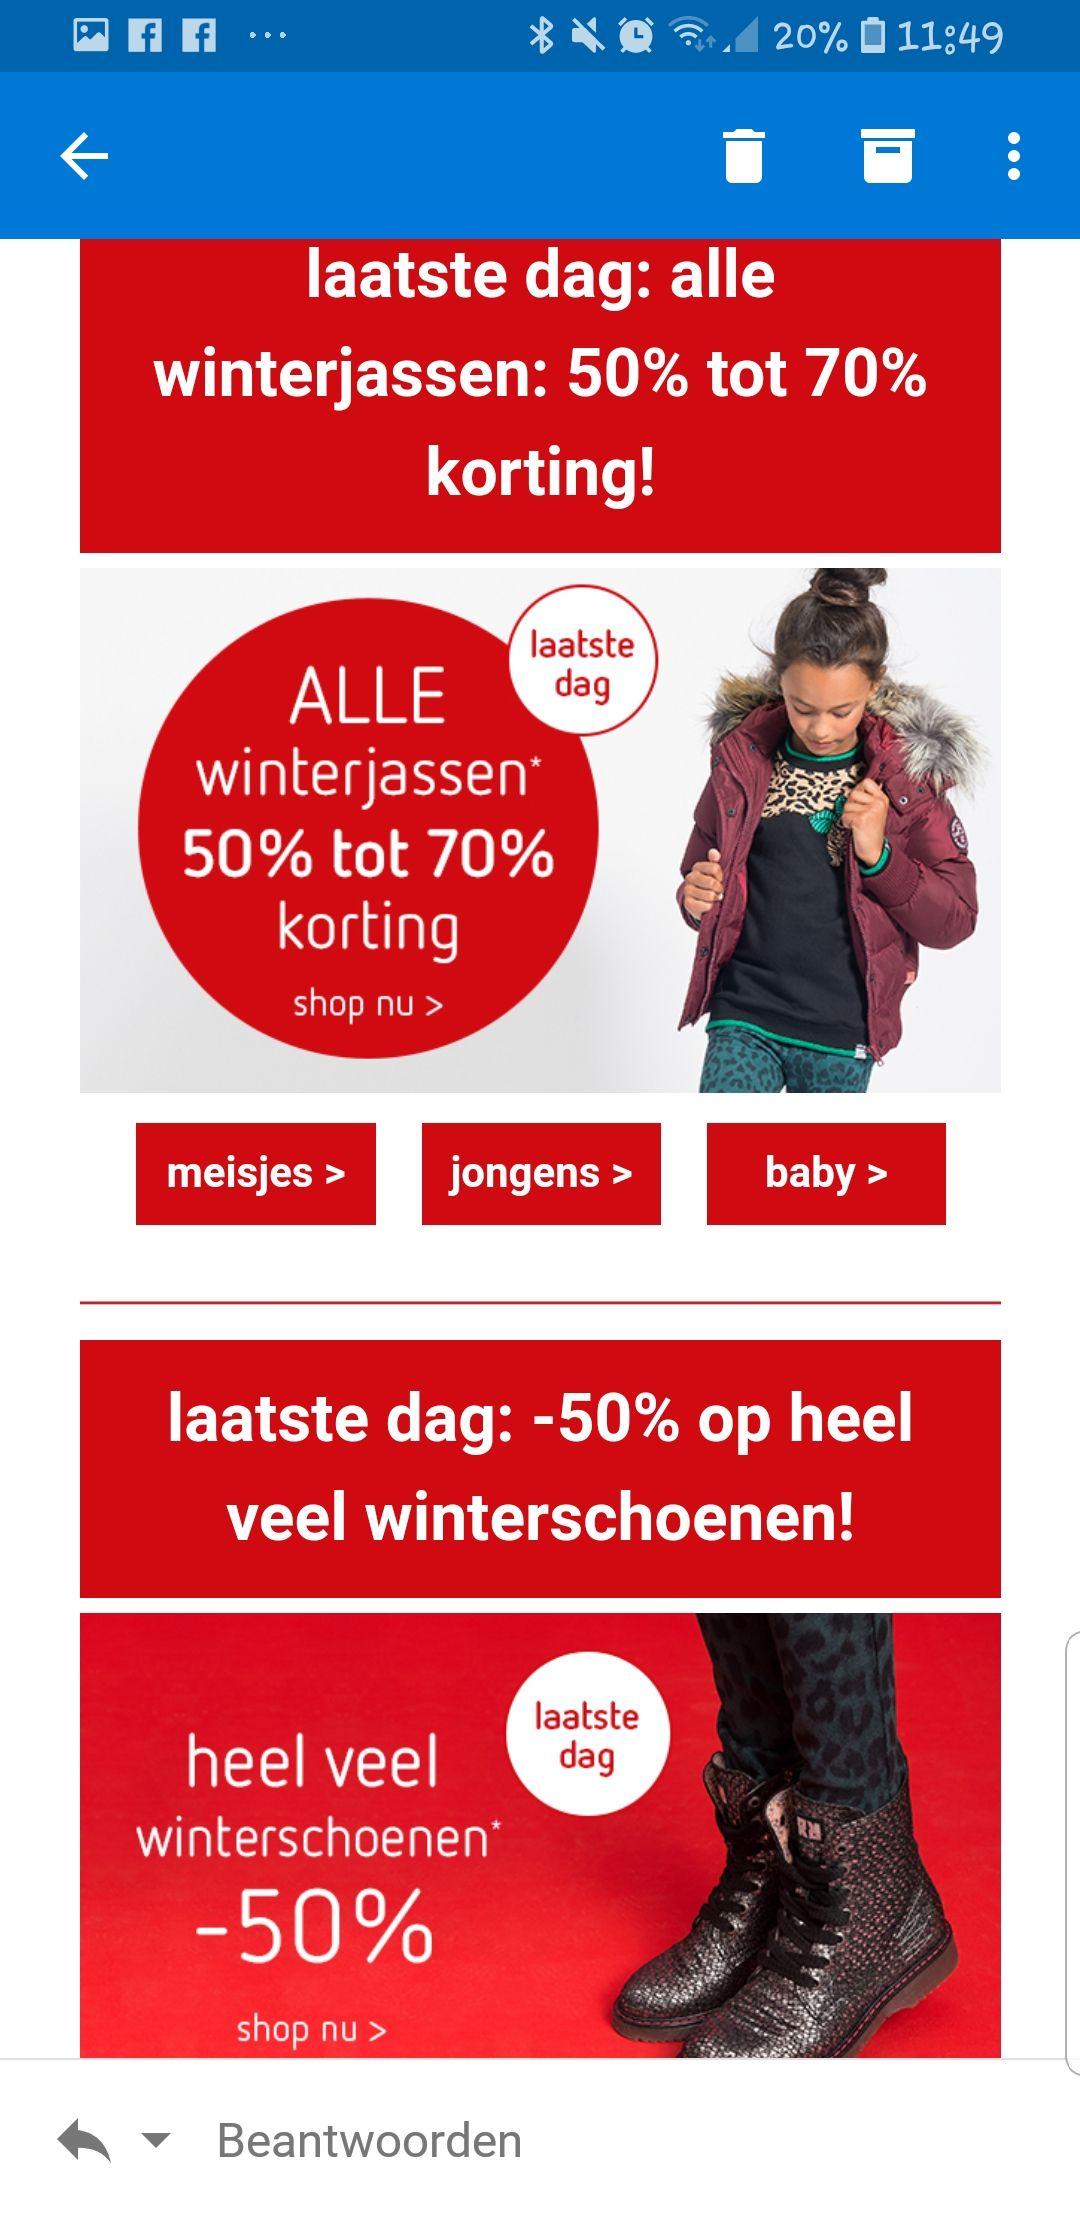 Kinderkleding 50% tot 70% korting in de sale